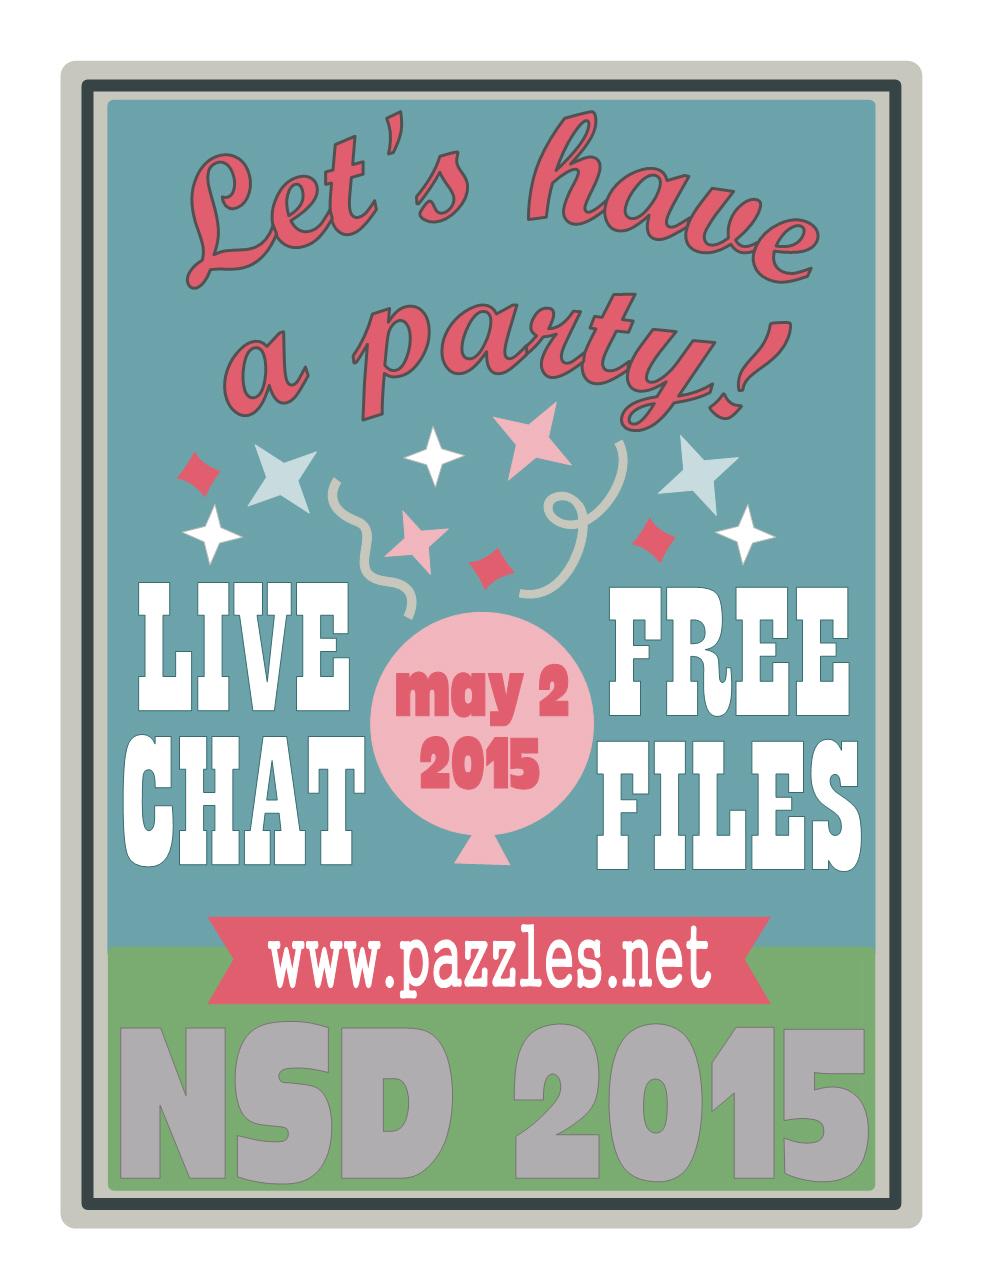 pazzles nsd2015